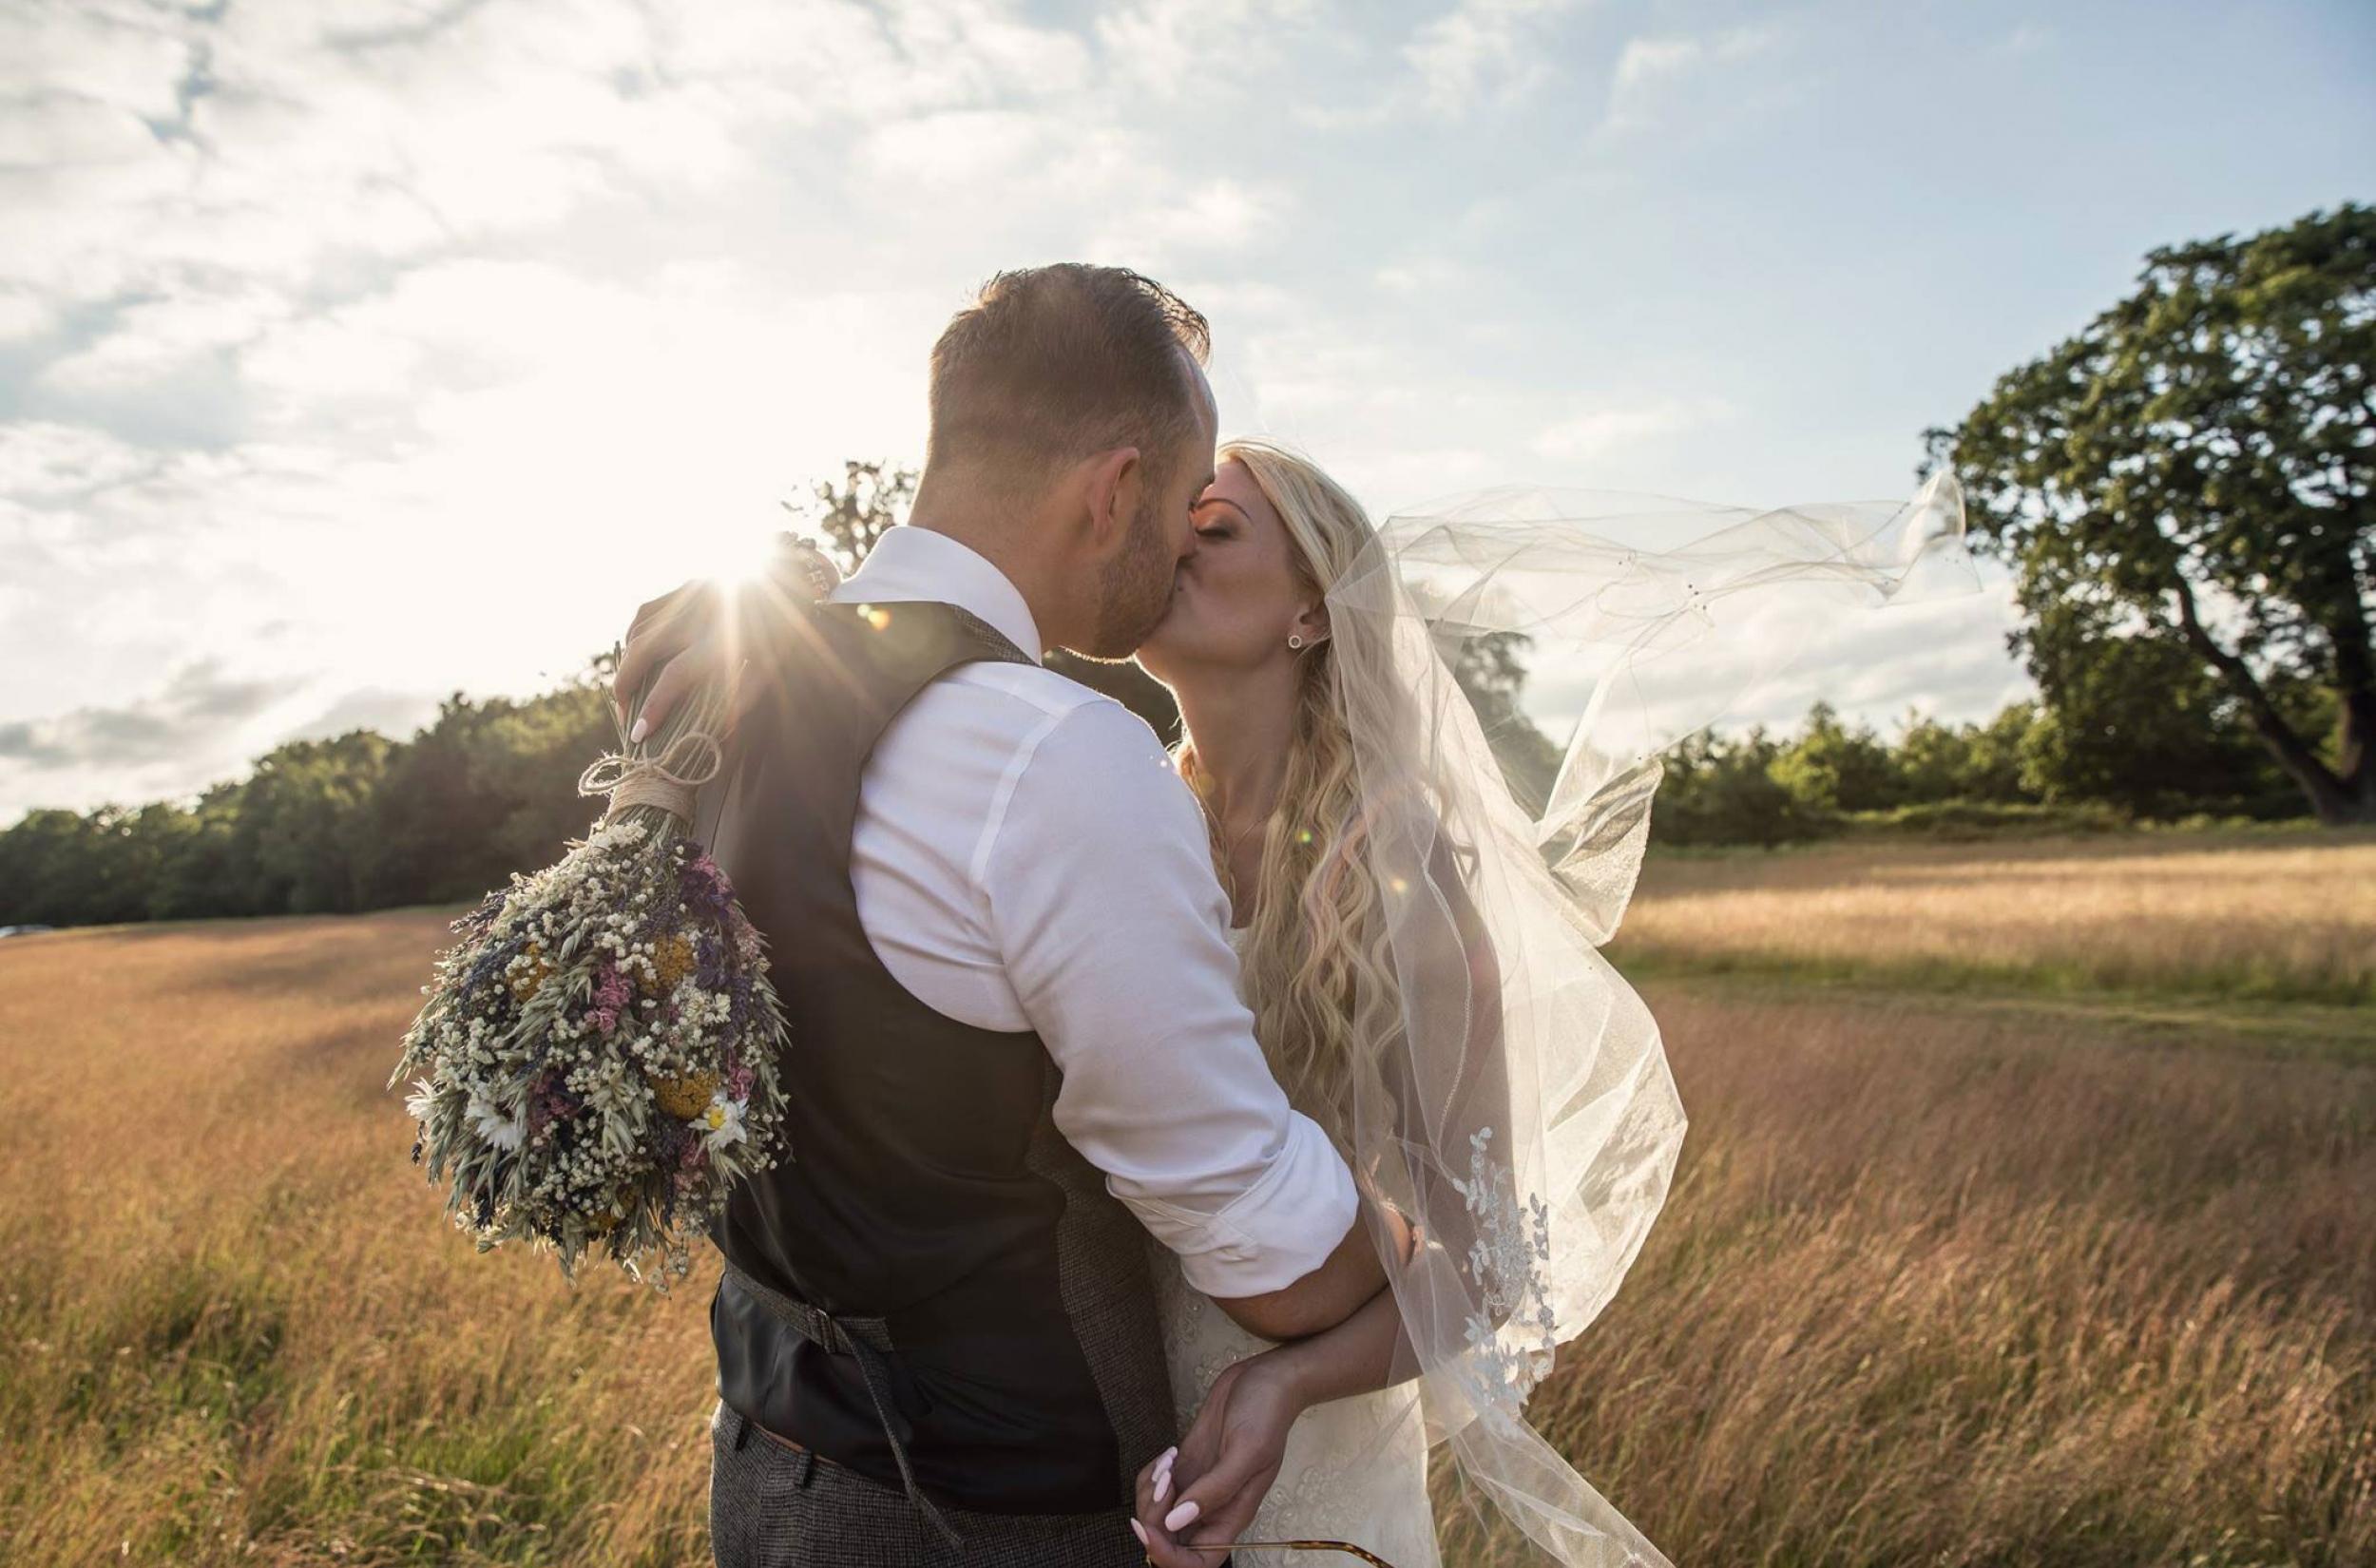 fiesta-fields-outdoor-wedding-events-company-tipi-surrey-sussex-5